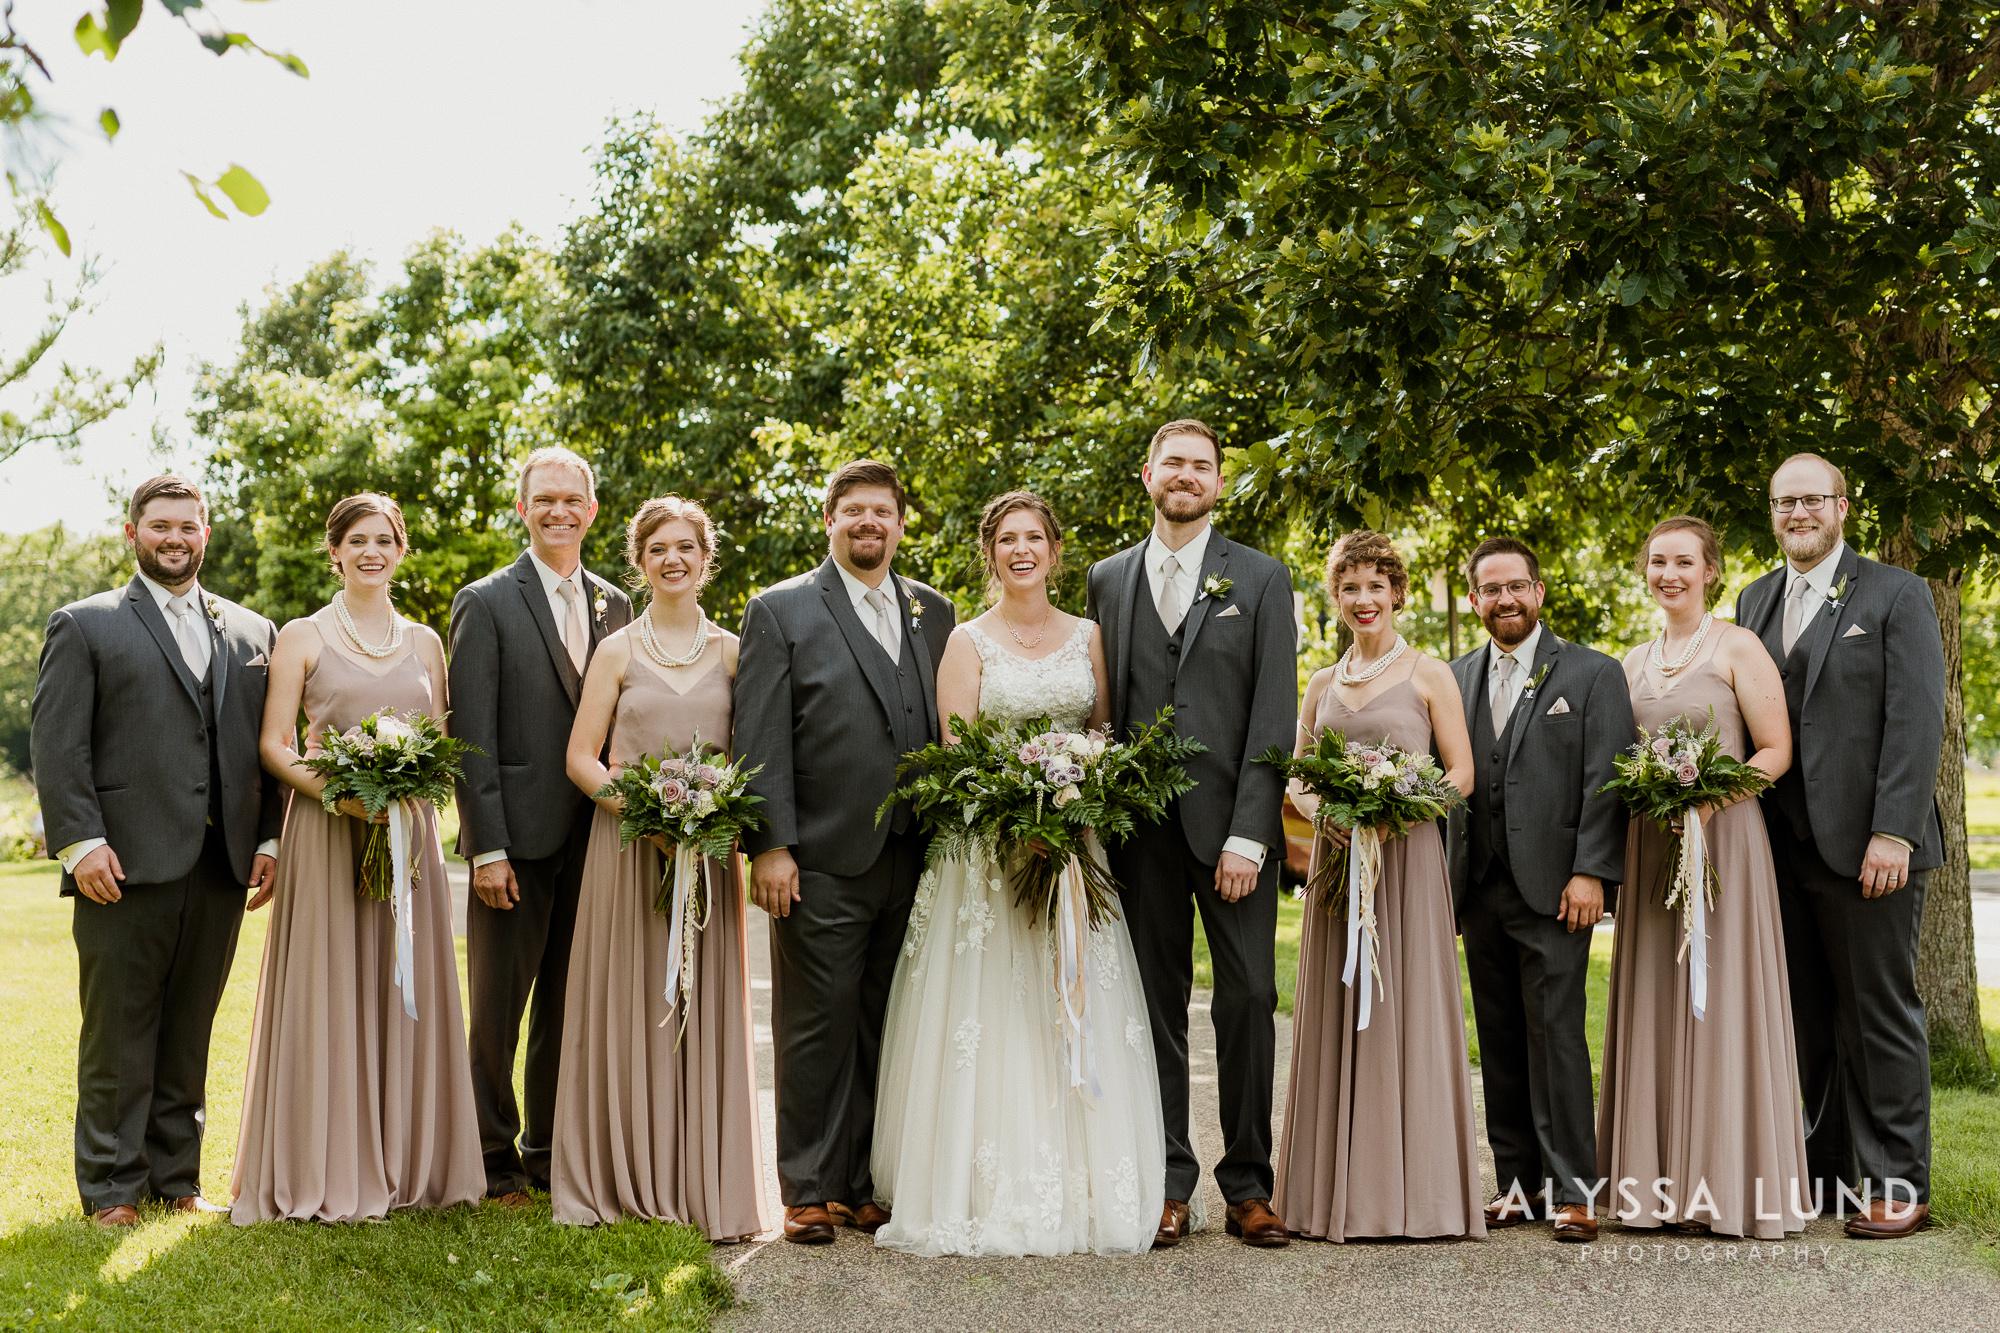 Creative Minneapolis Wedding Photography by Alyssa Lund Photography.jpg